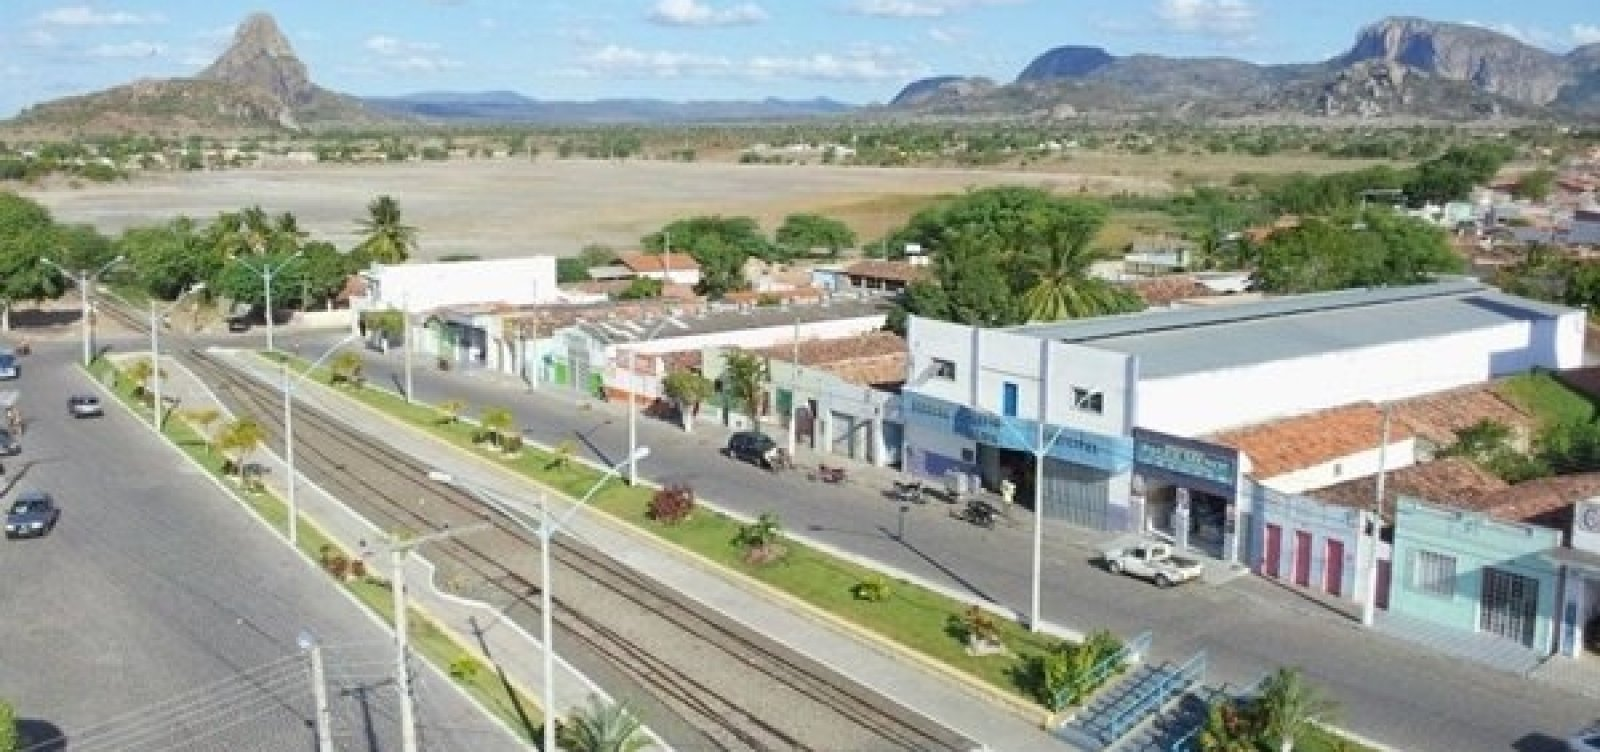 Itatim Bahia fonte: www.metro1.com.br